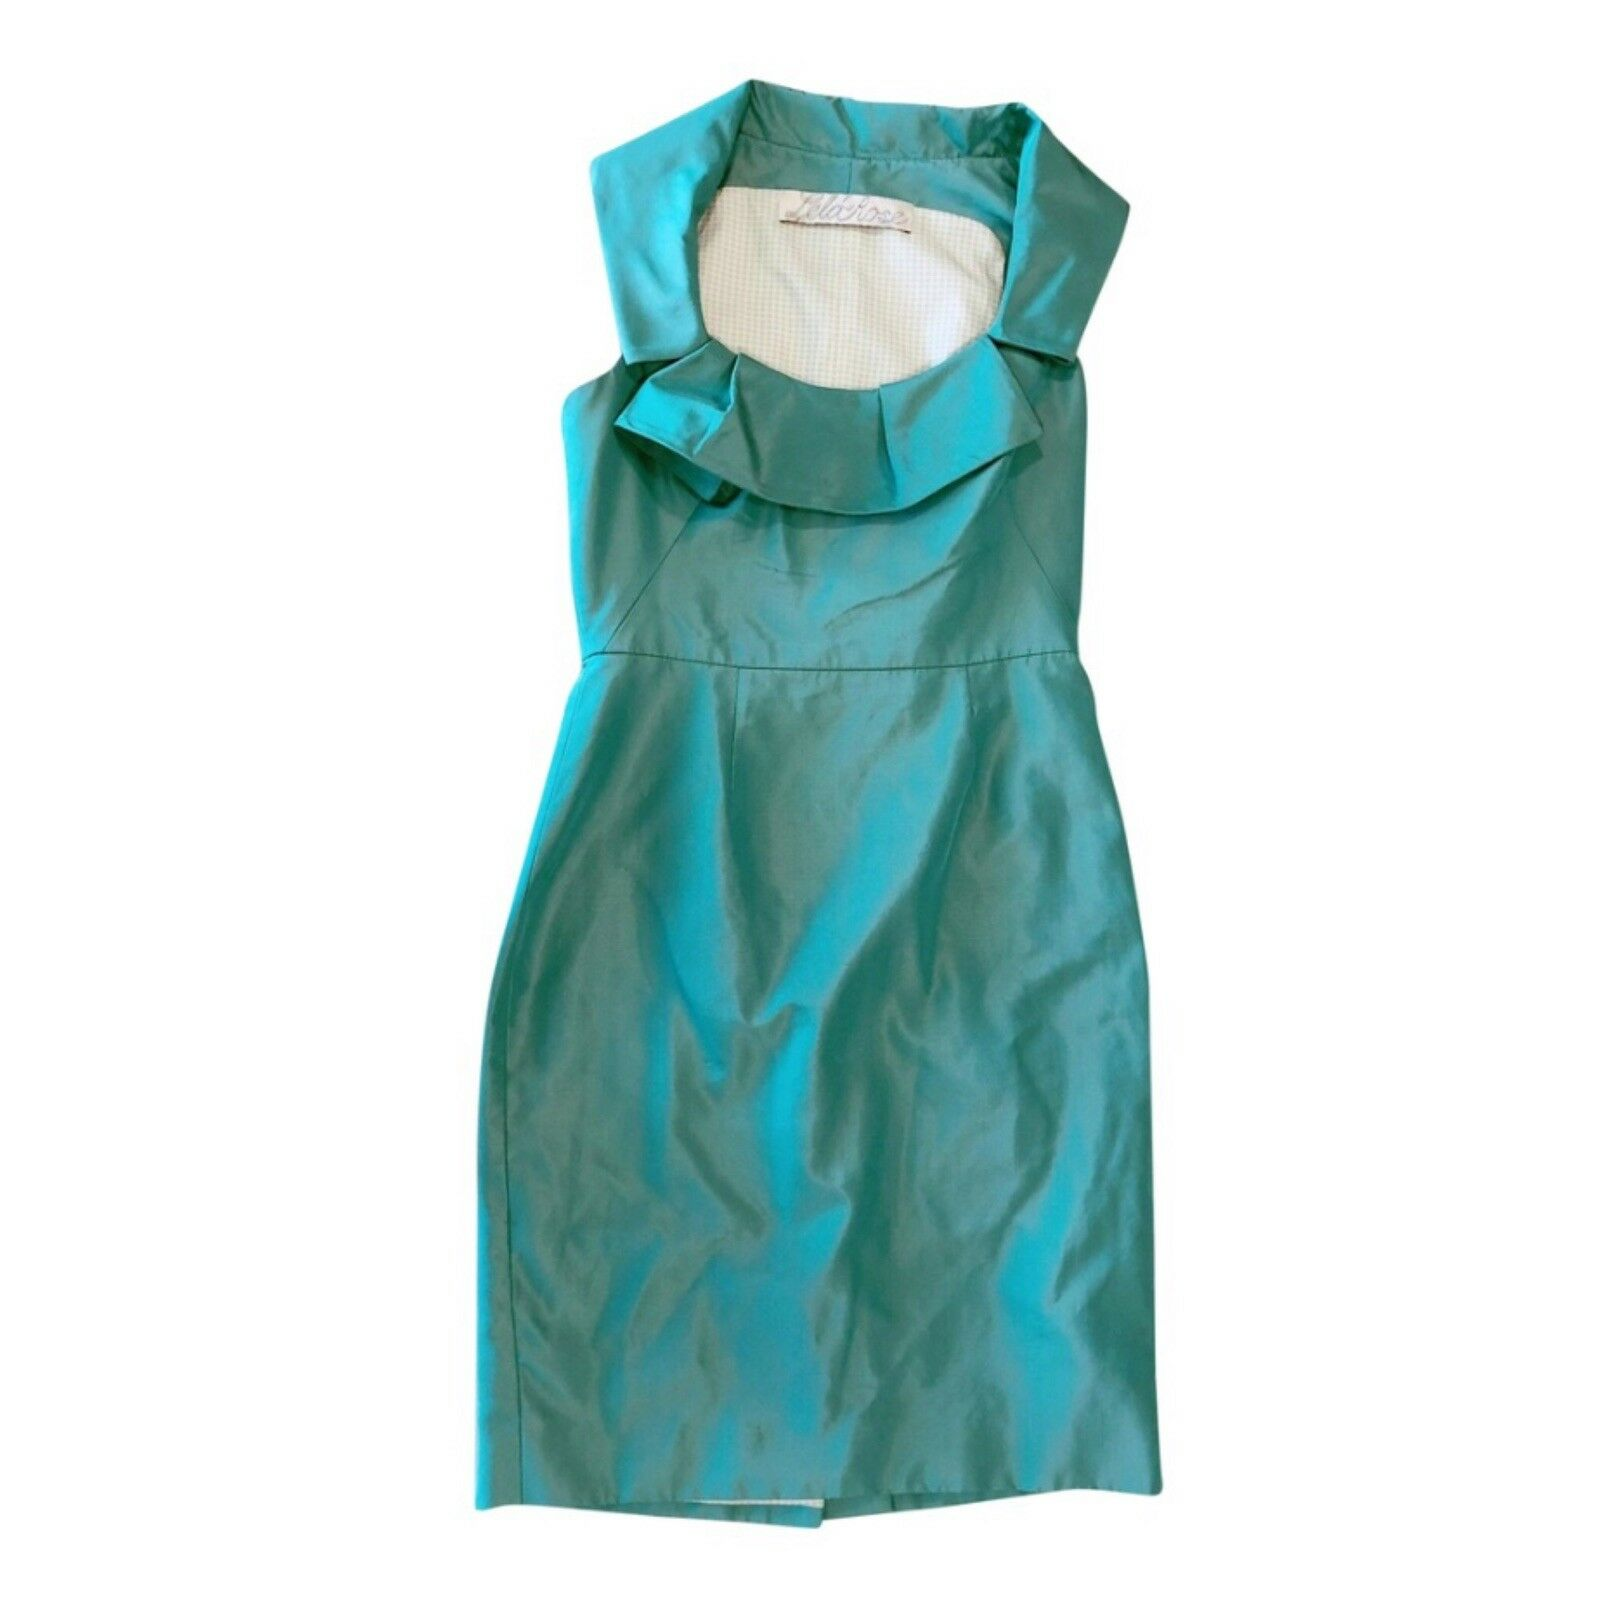 Lela Rosa Grün Silk Fitted Cocktail Sheath Dress SZ 4